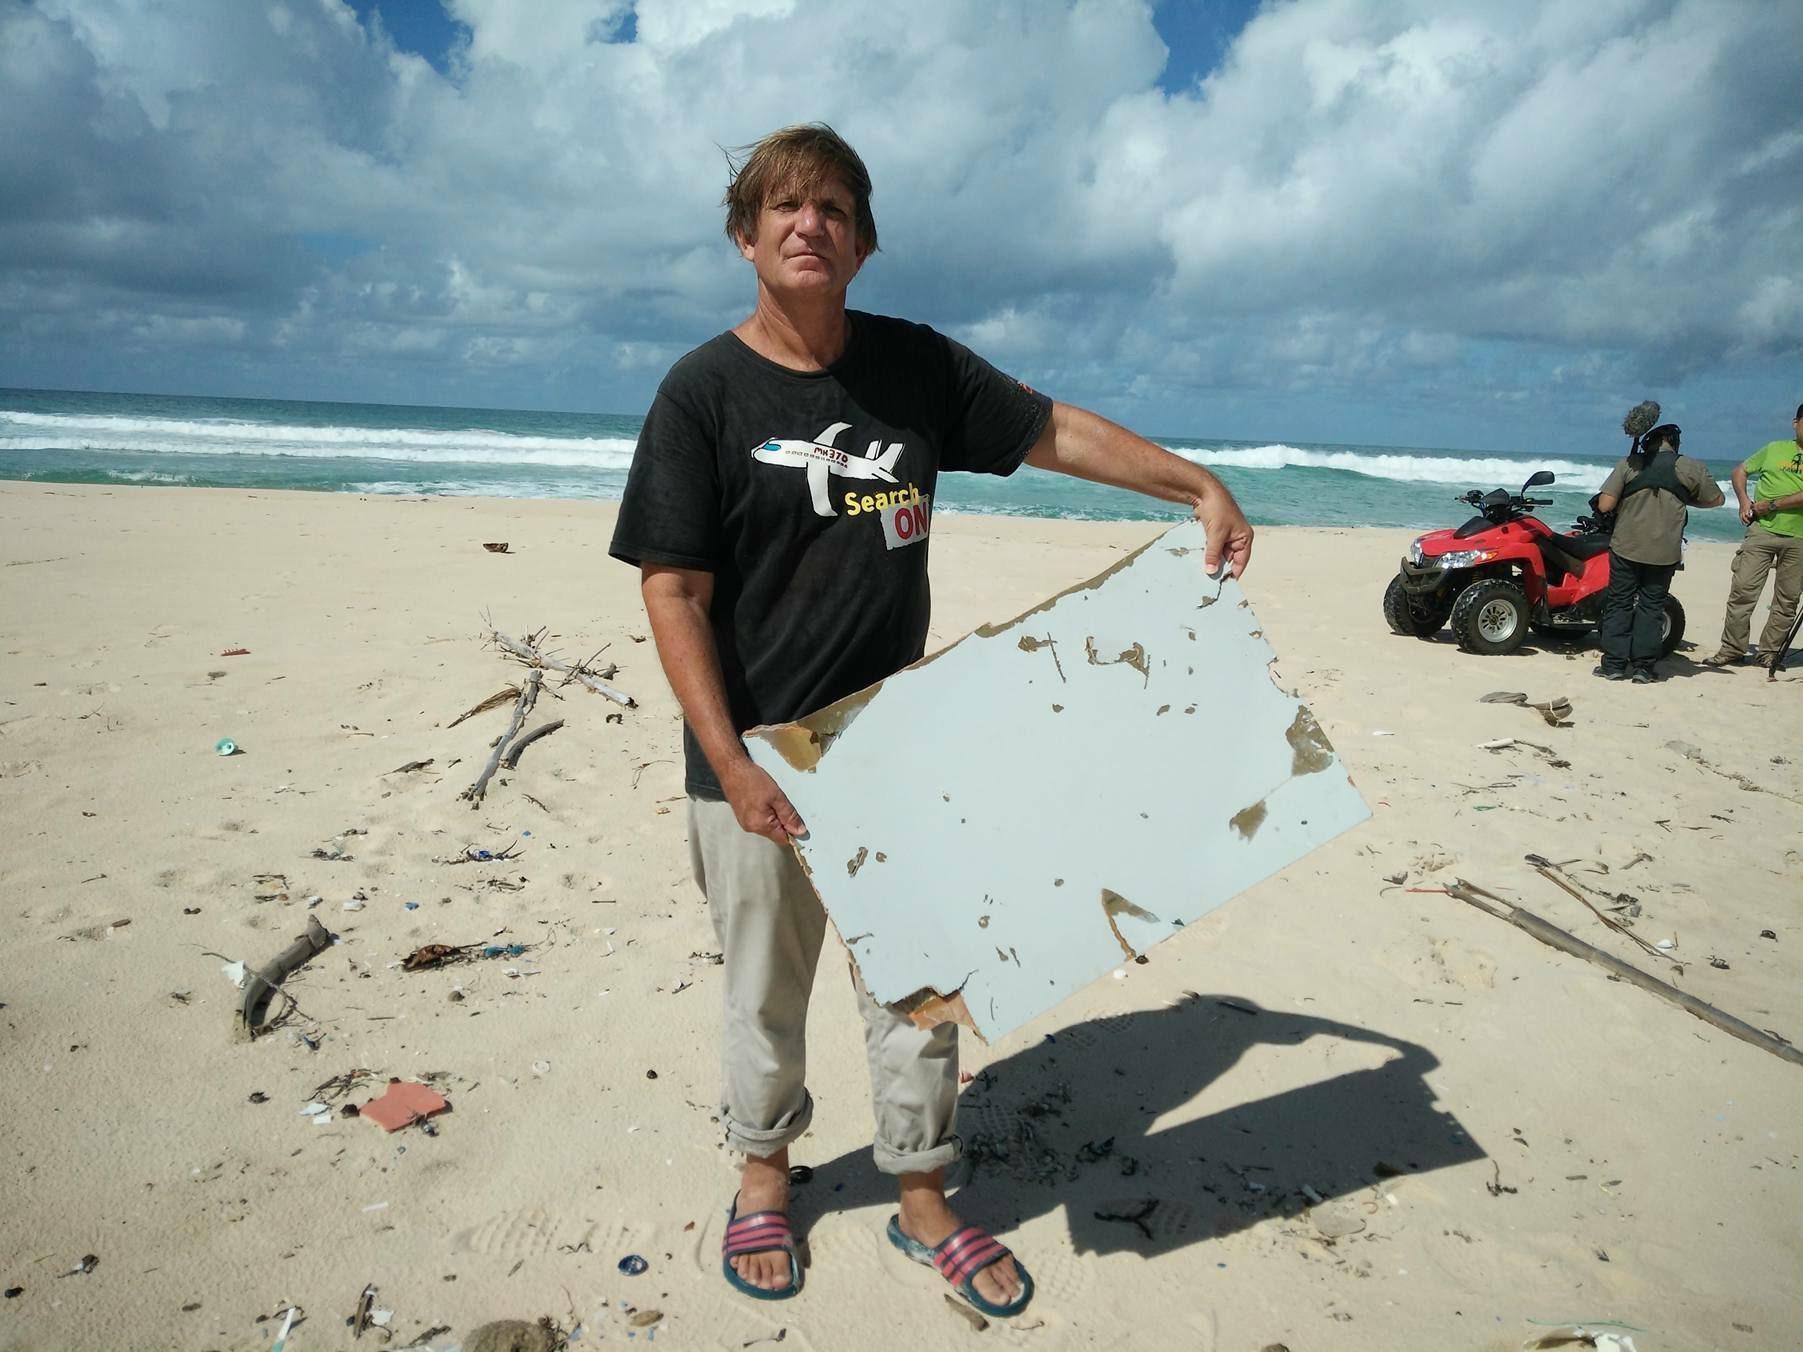 Un fragment de aripa gasit in Mauritius, confirmat oficial ca provenind de la zborul MH370. Misterul ramane nerezolvat